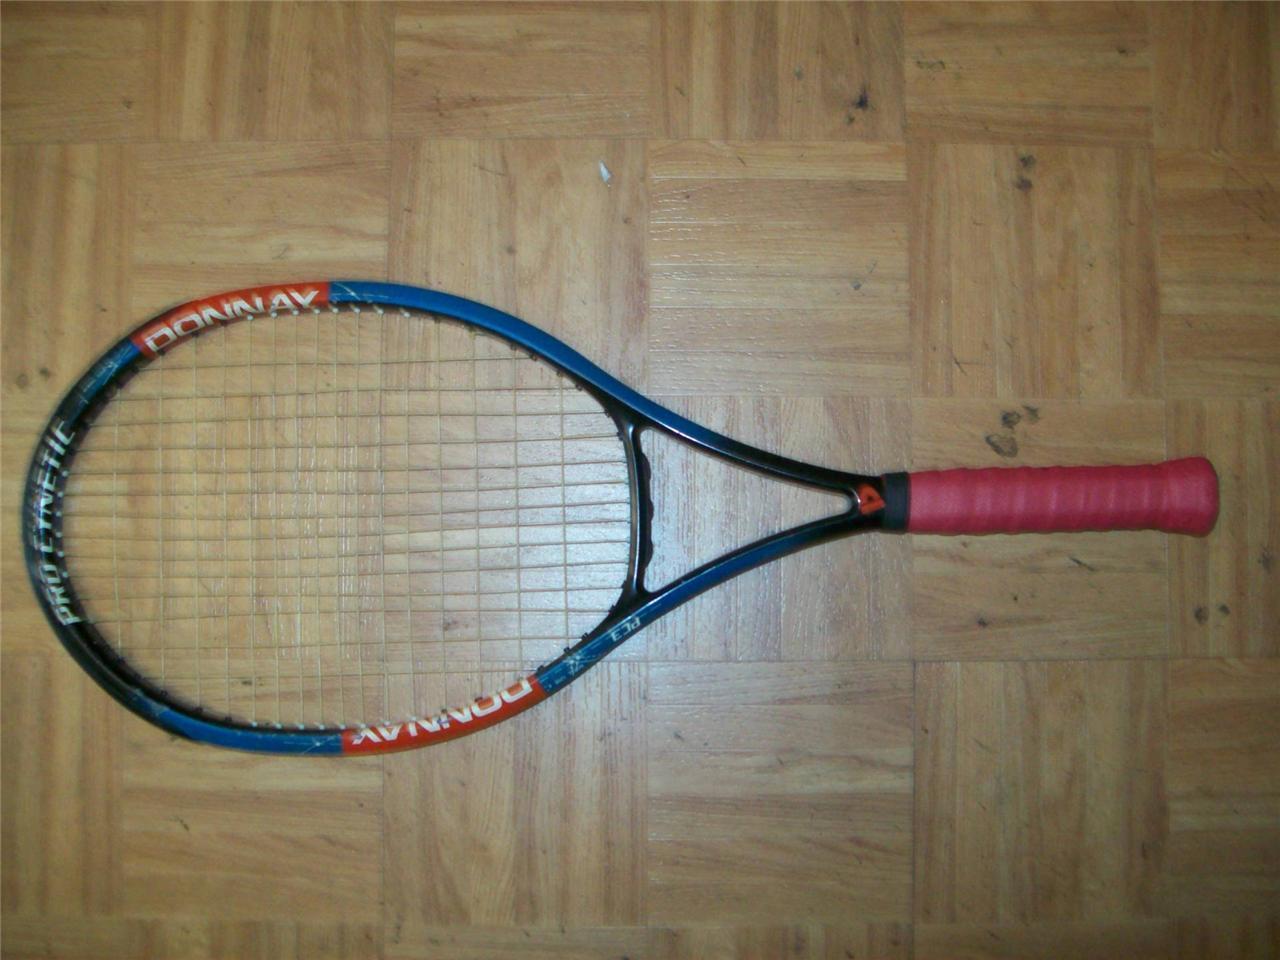 femmesY Pro cynetic PC3 midplus 100 4 3 8 Raquette de Tennis